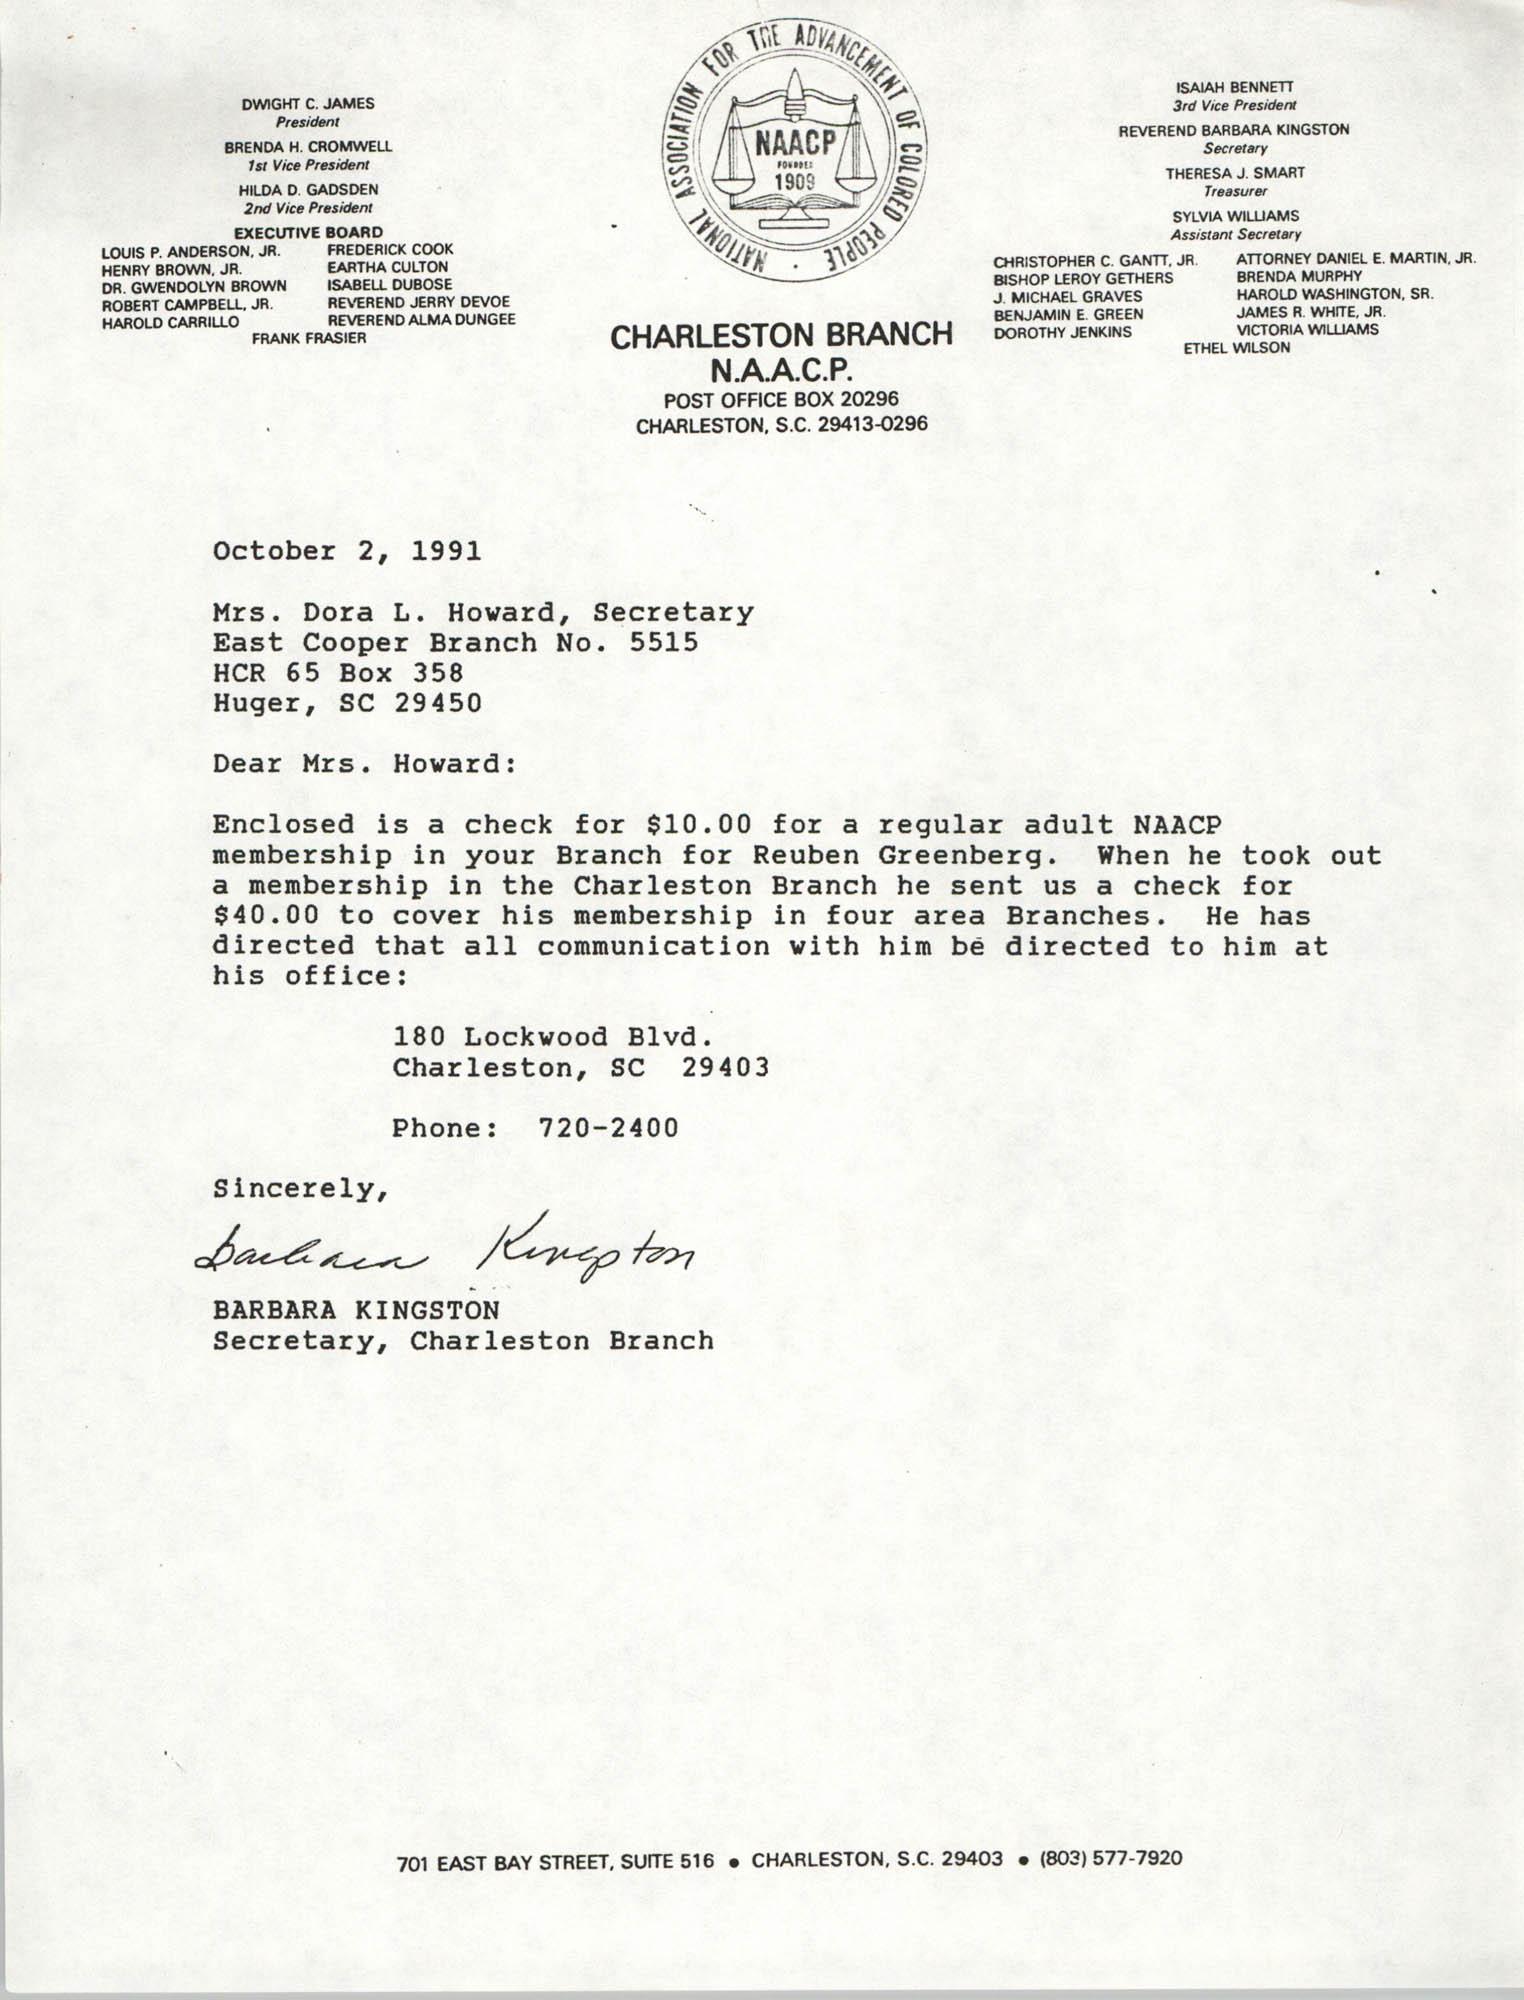 Letter from Barbara Kingston to Dora L. Howard, October 2, 1991